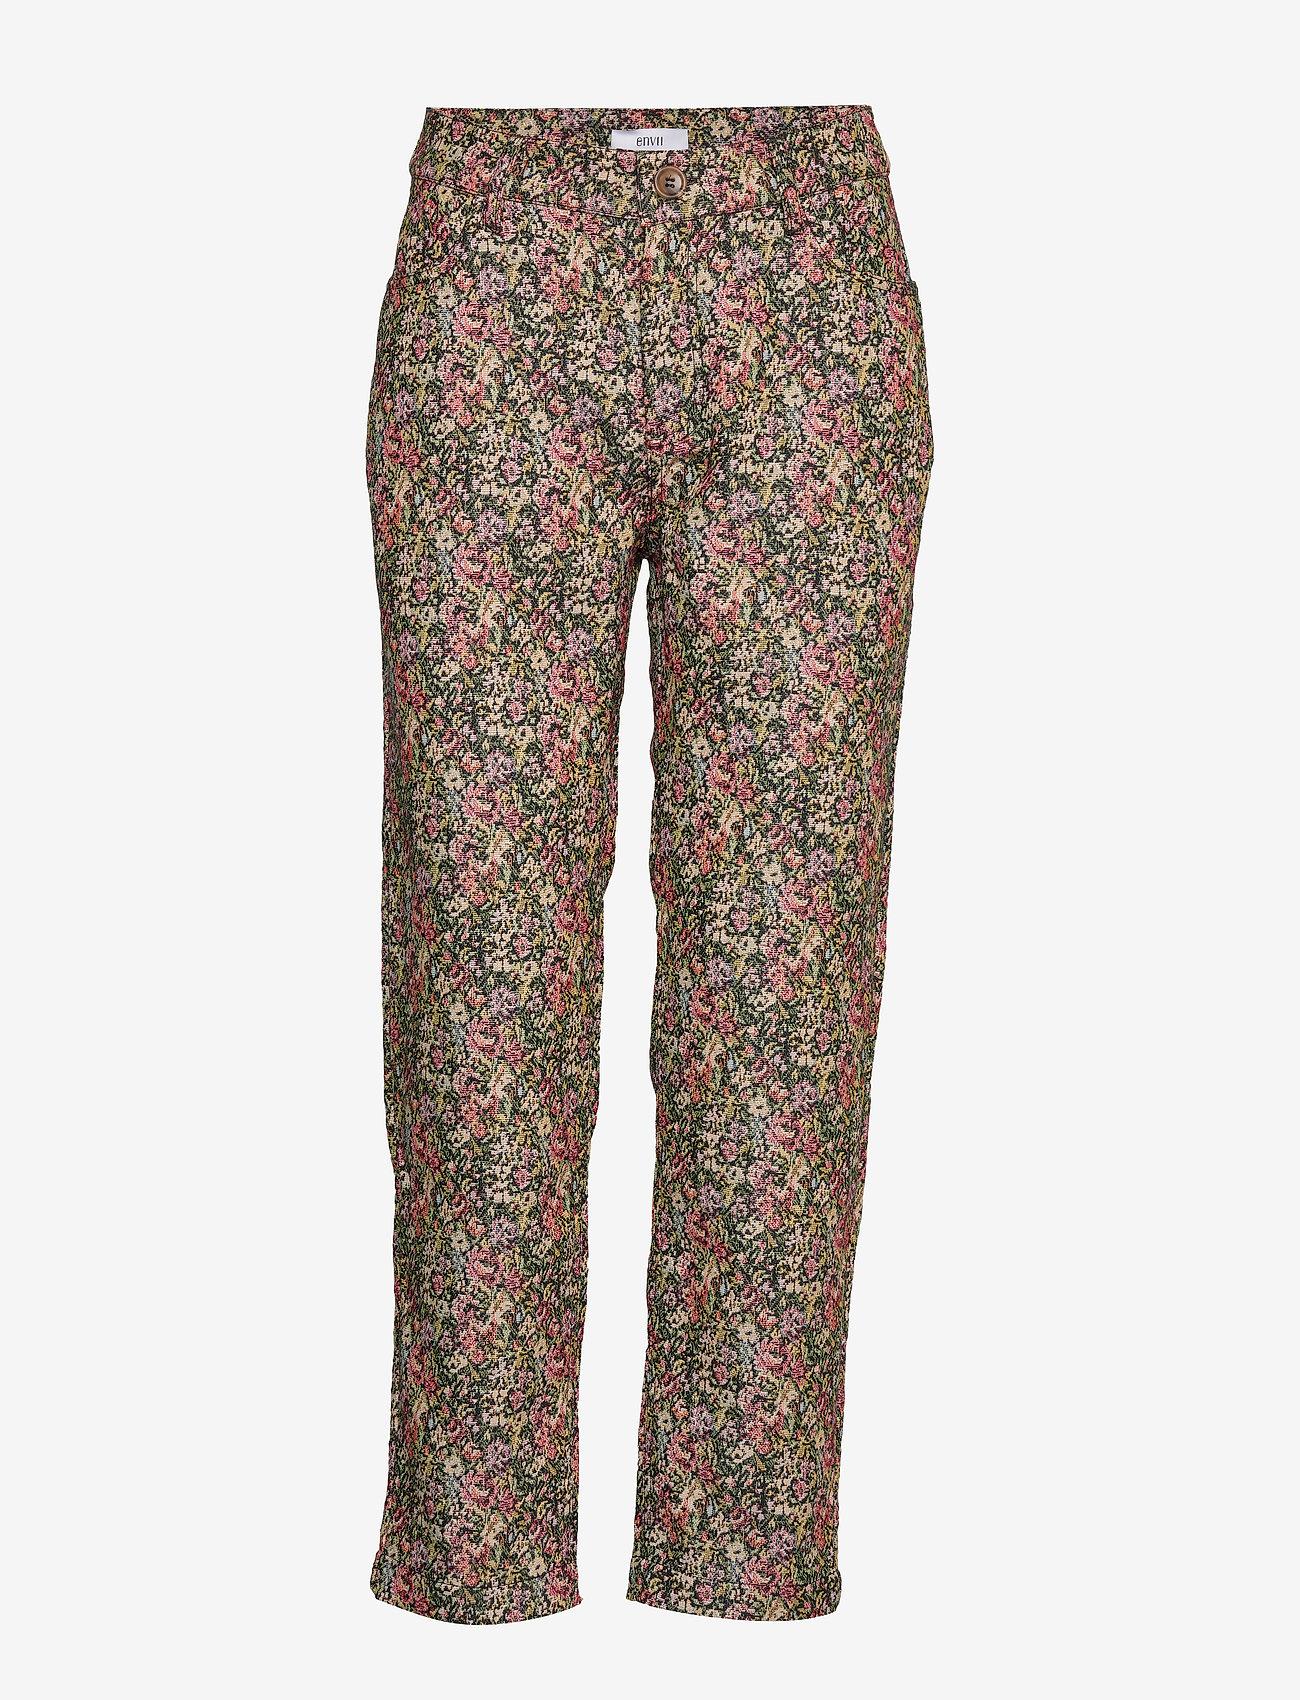 Enagate Pants 6689 (Floral Couch) - Envii 9ZiMrL